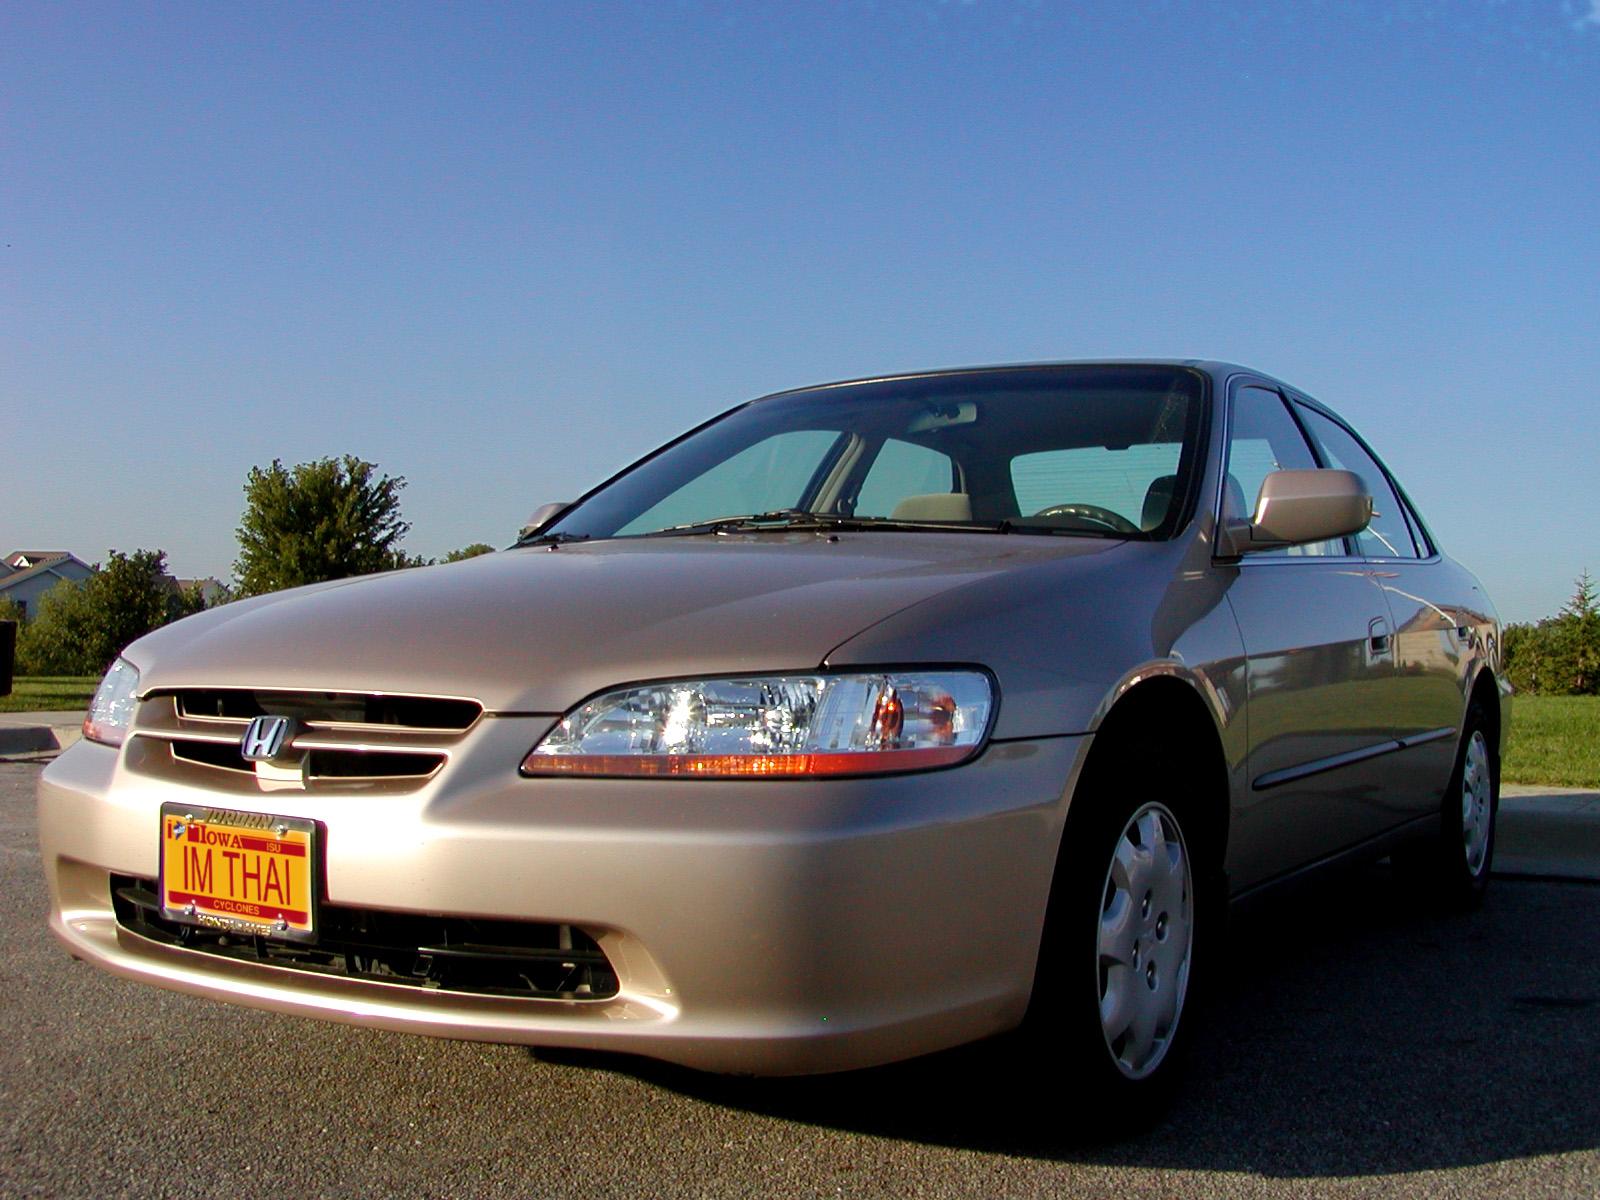 File:Honda Accord 2000 LX